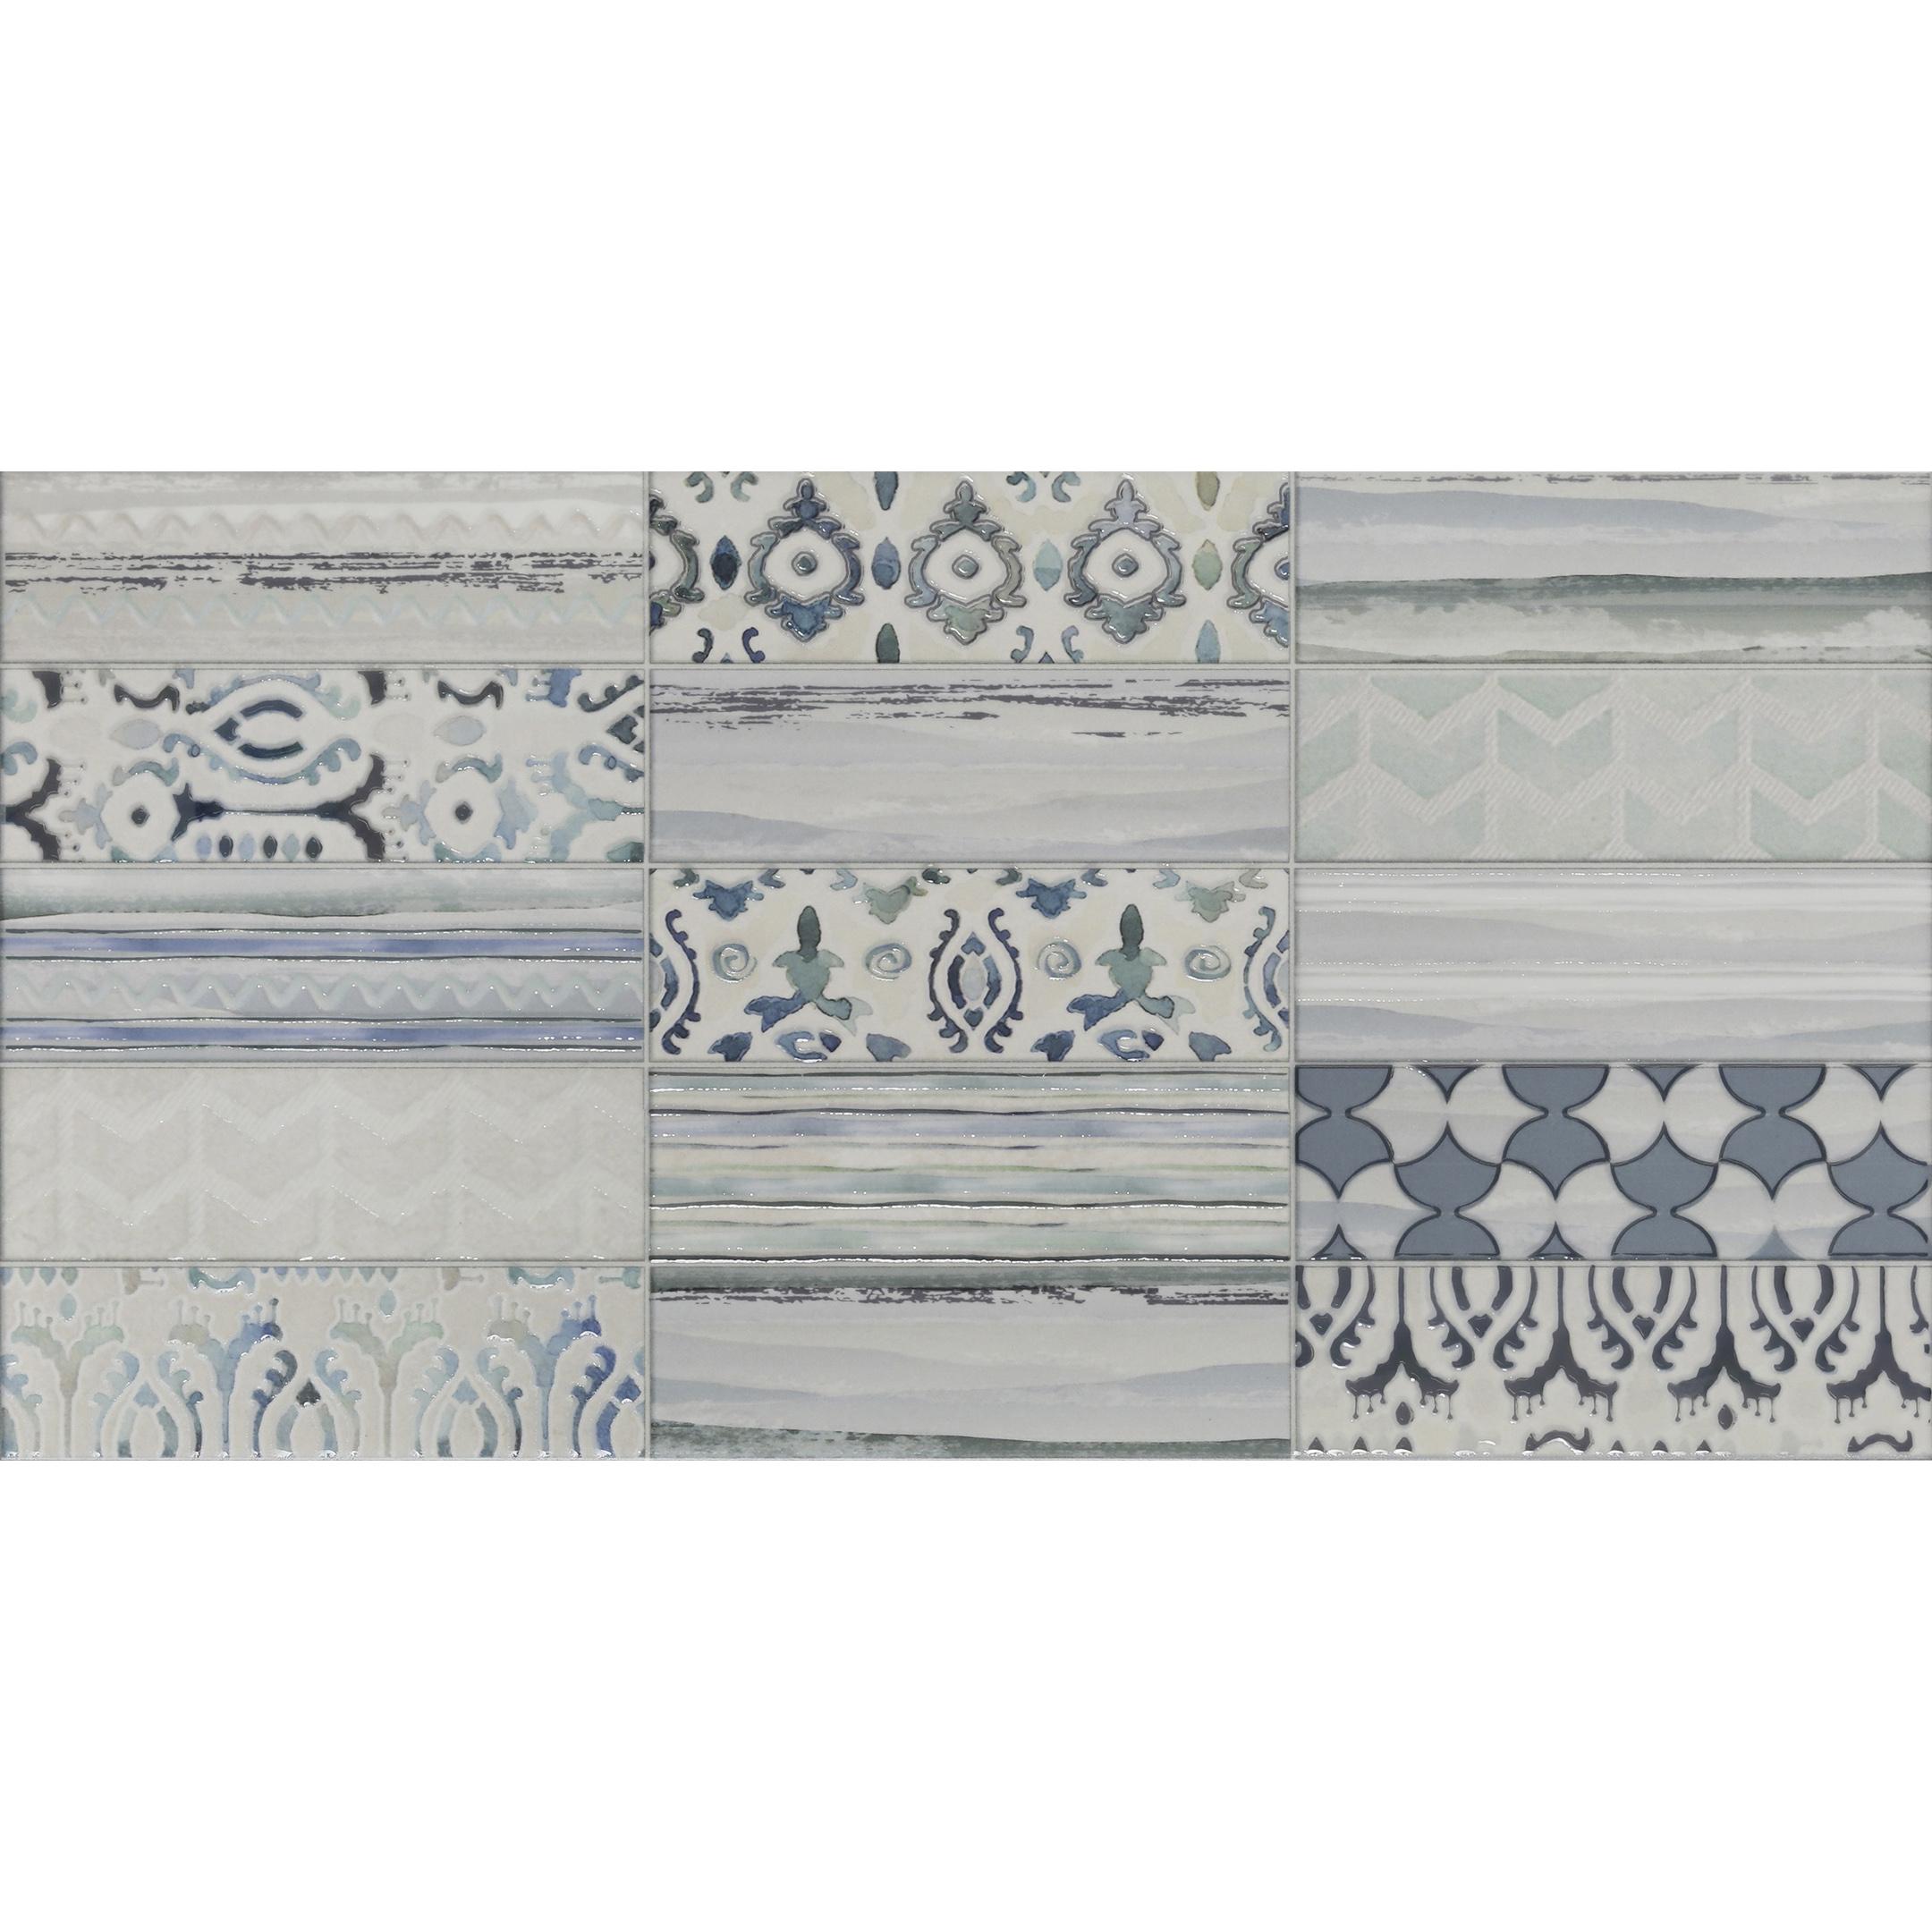 Плитка декор Нефрит-Керамика Ванкувер голубой майолика 250x500x9 мм фото